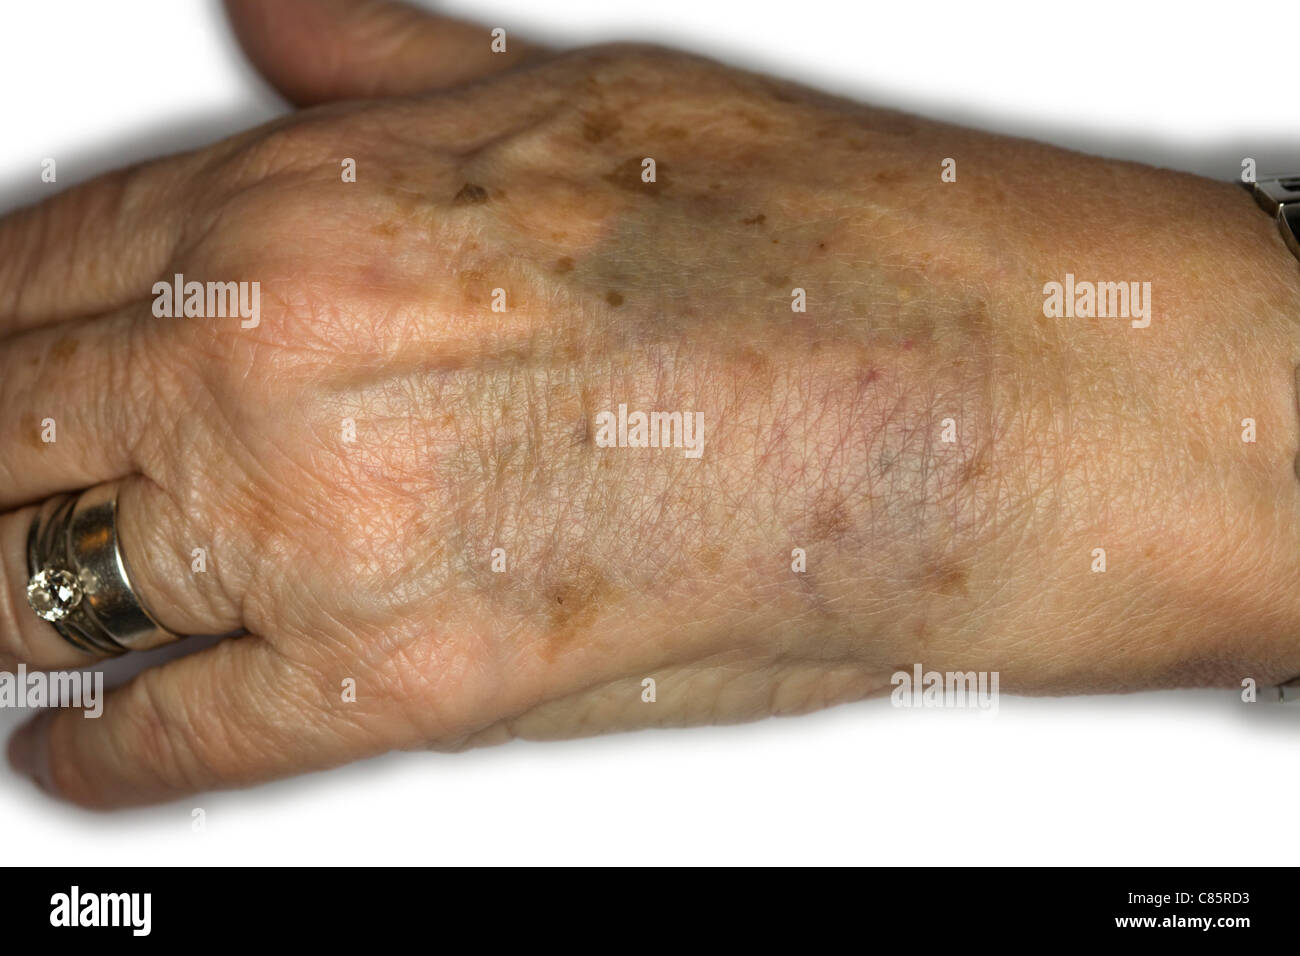 Elderly Woman Bruised Hand - Stock Image